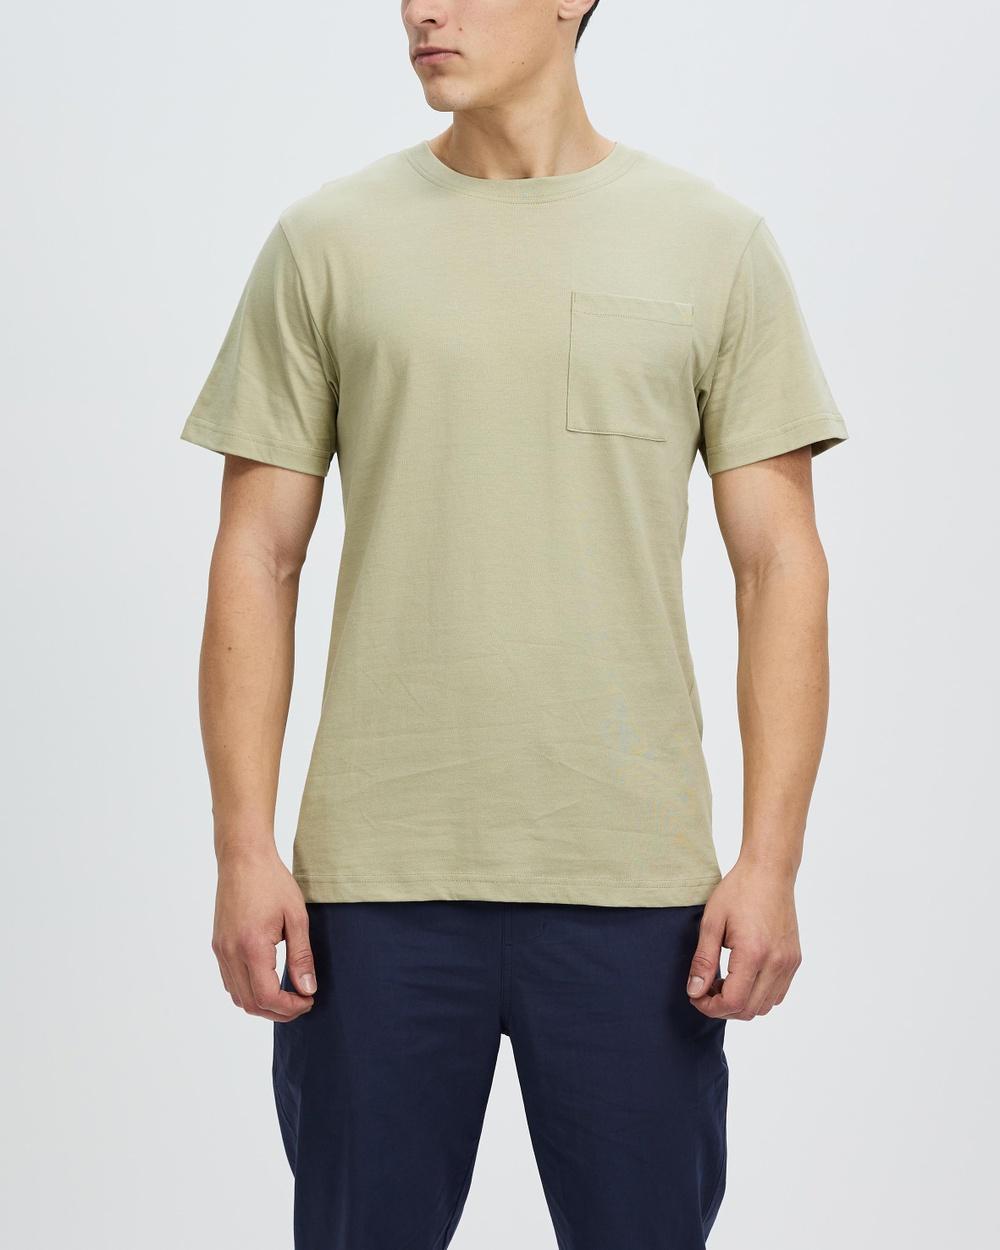 AERE Relaxed Organic Cotton Pocket Tee T-Shirts & Singlets Light Khaki